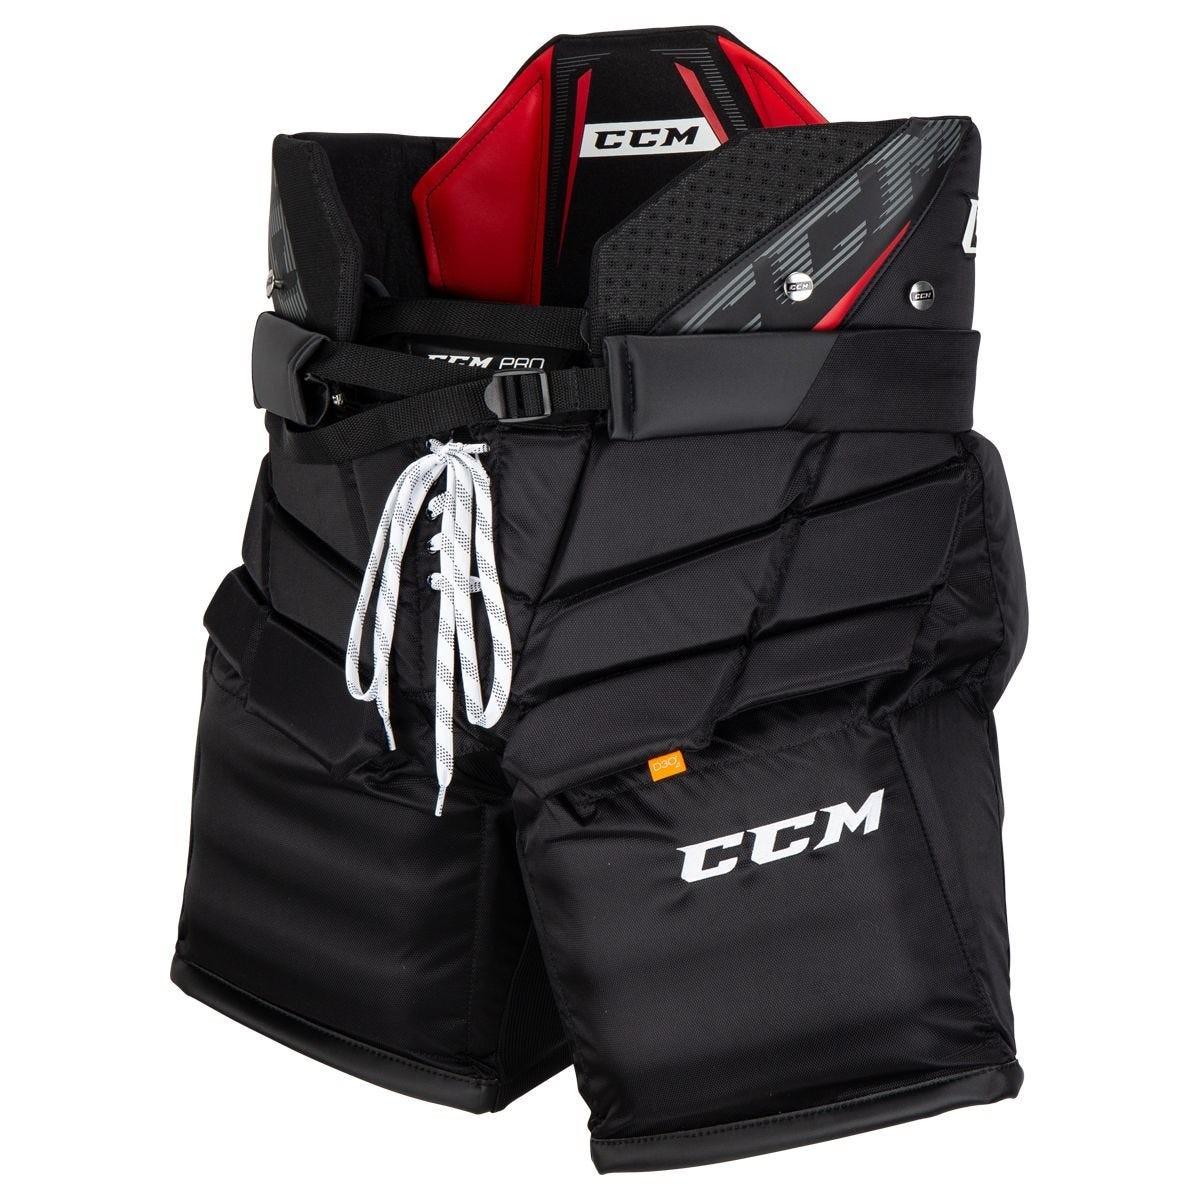 CCM Pro Senior Goalie Pants